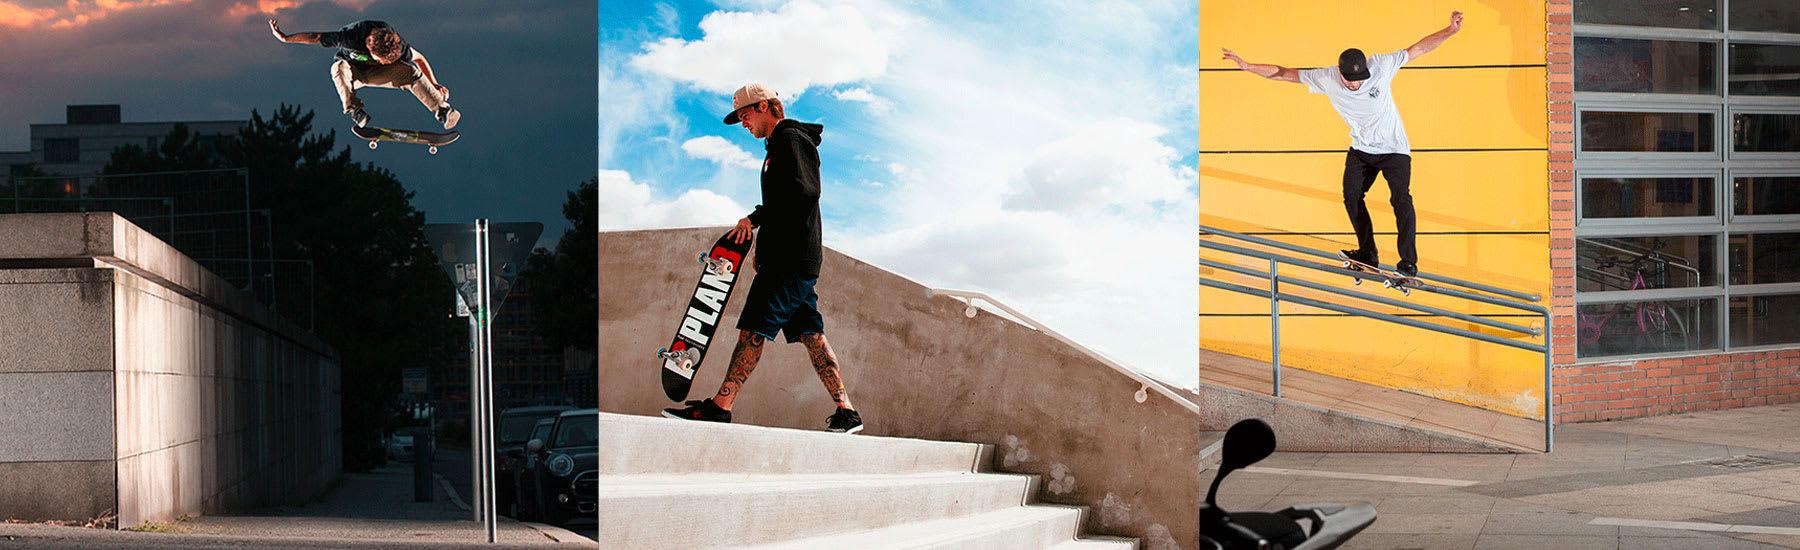 Etnies Skate Shoes, Skateboard Clothing, Shirts, Pants, Hoodies, Sandals